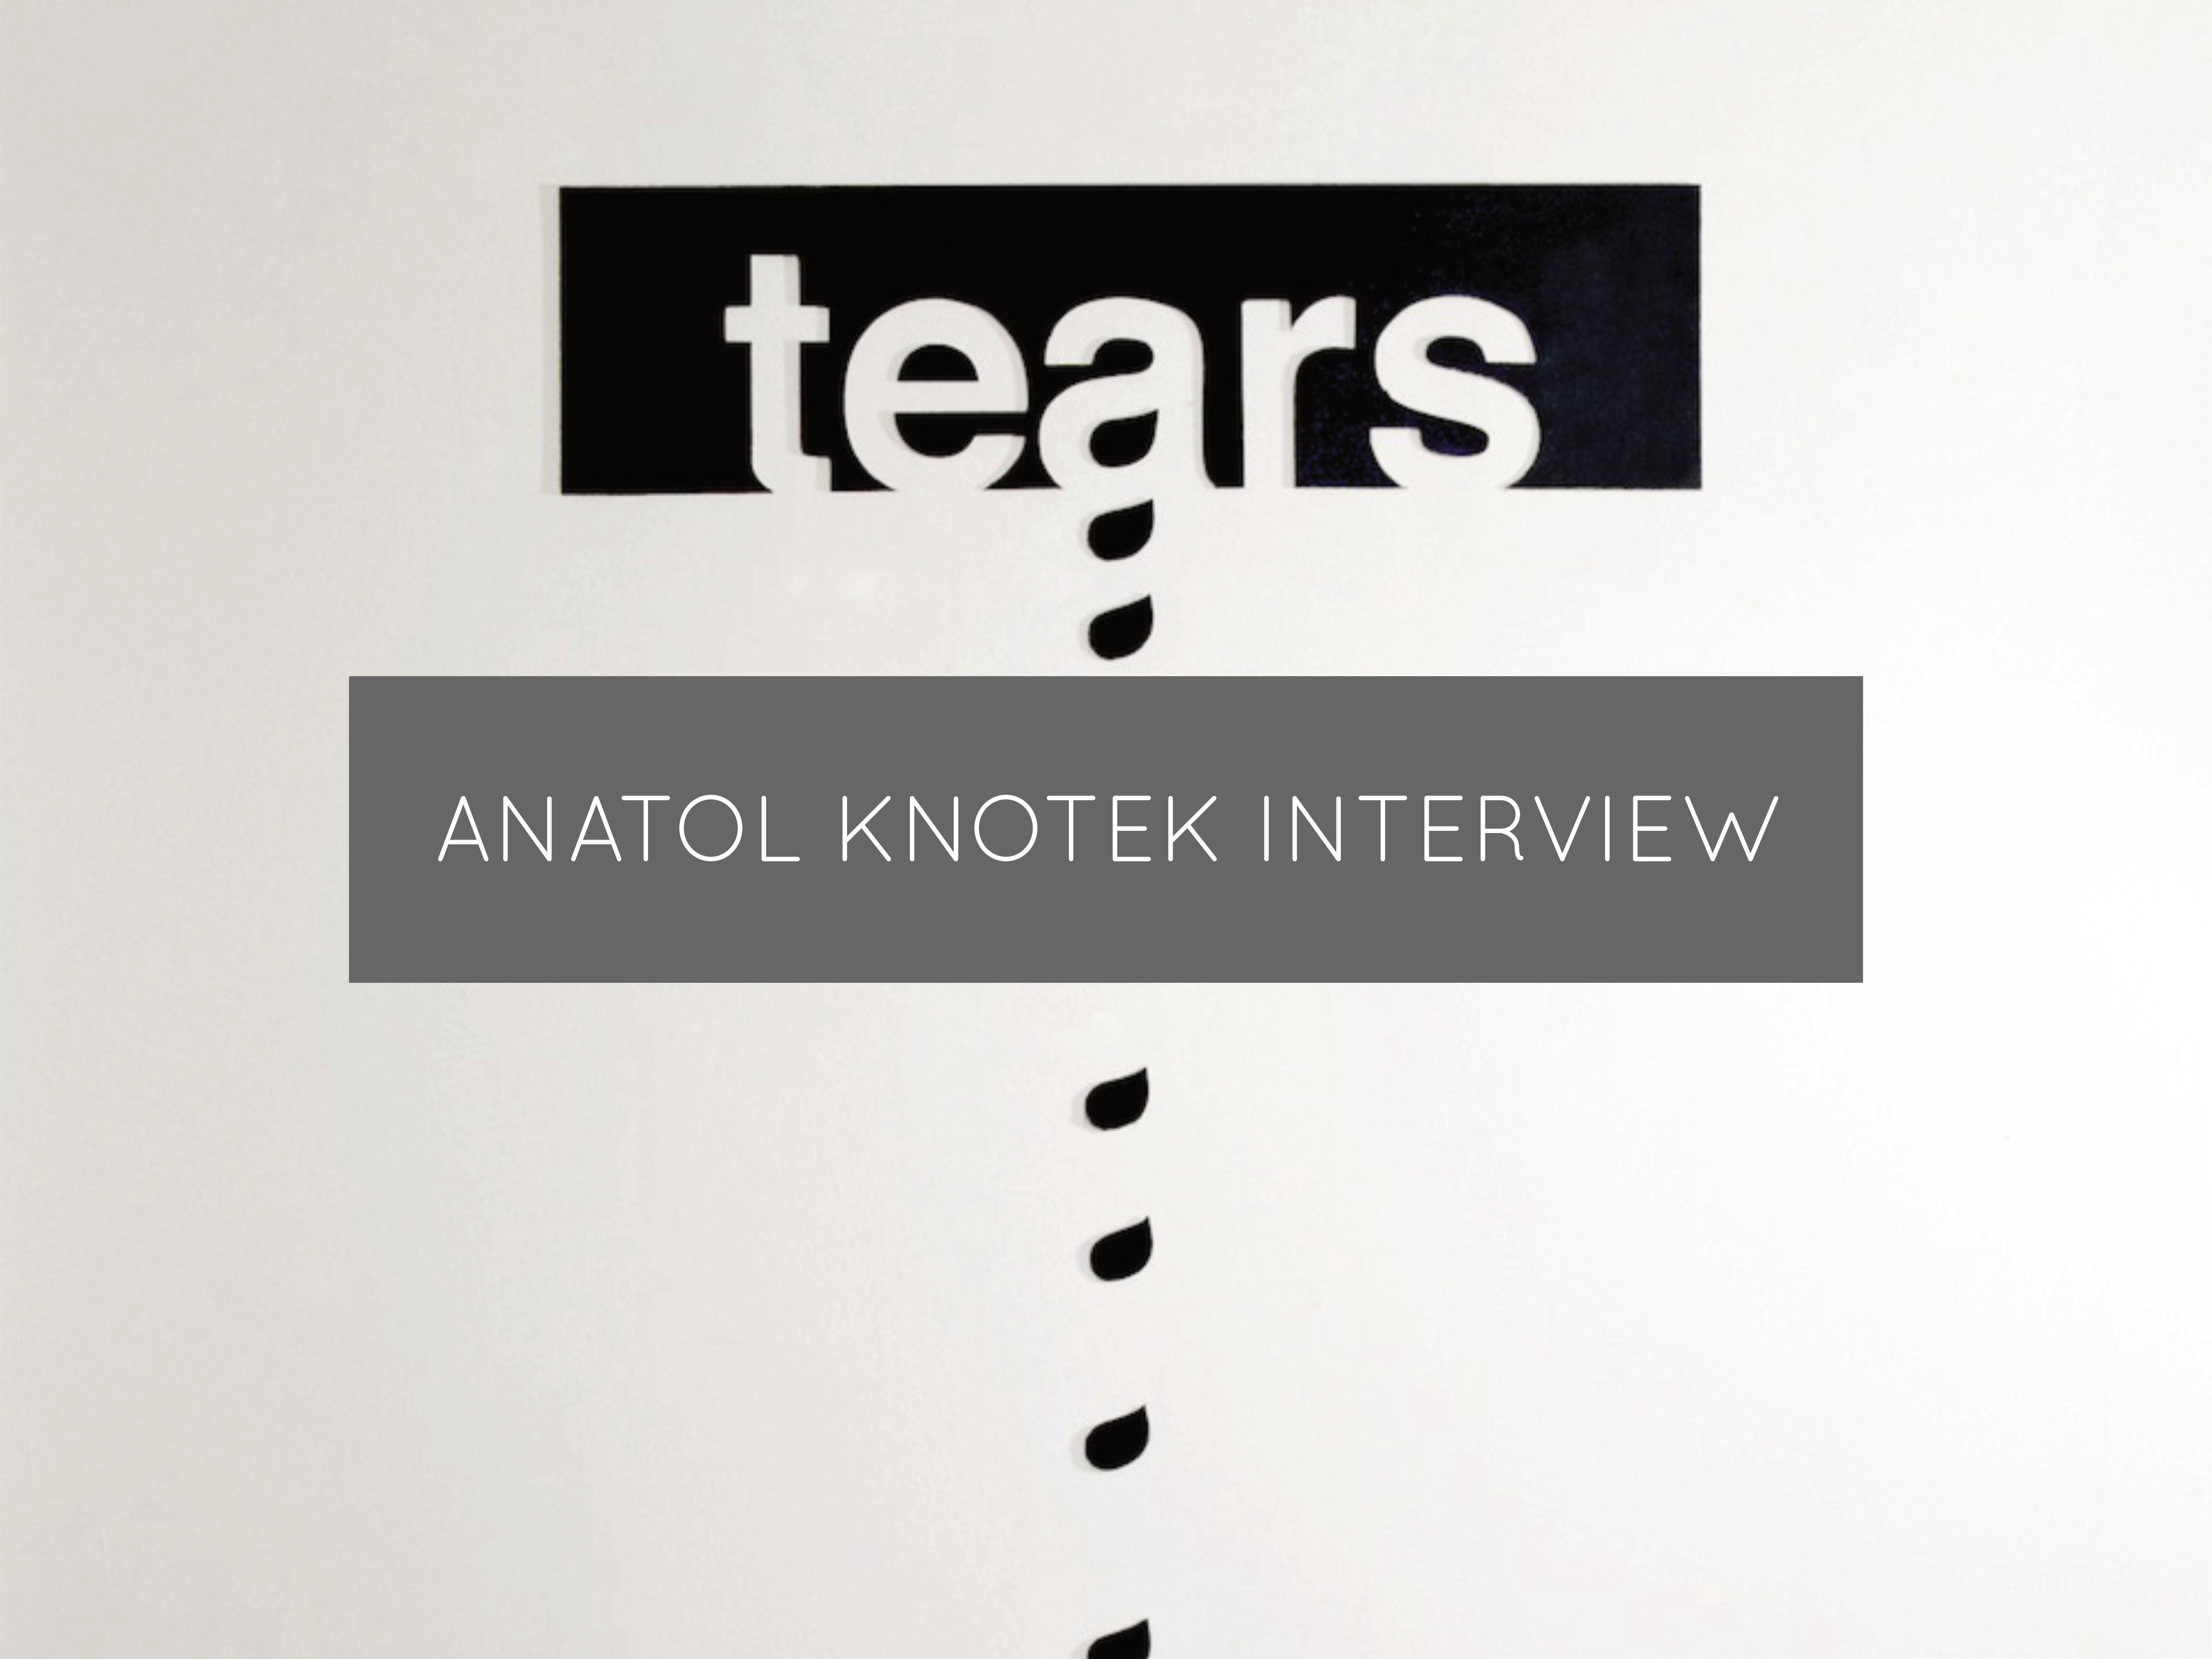 Anatol knotek nterview